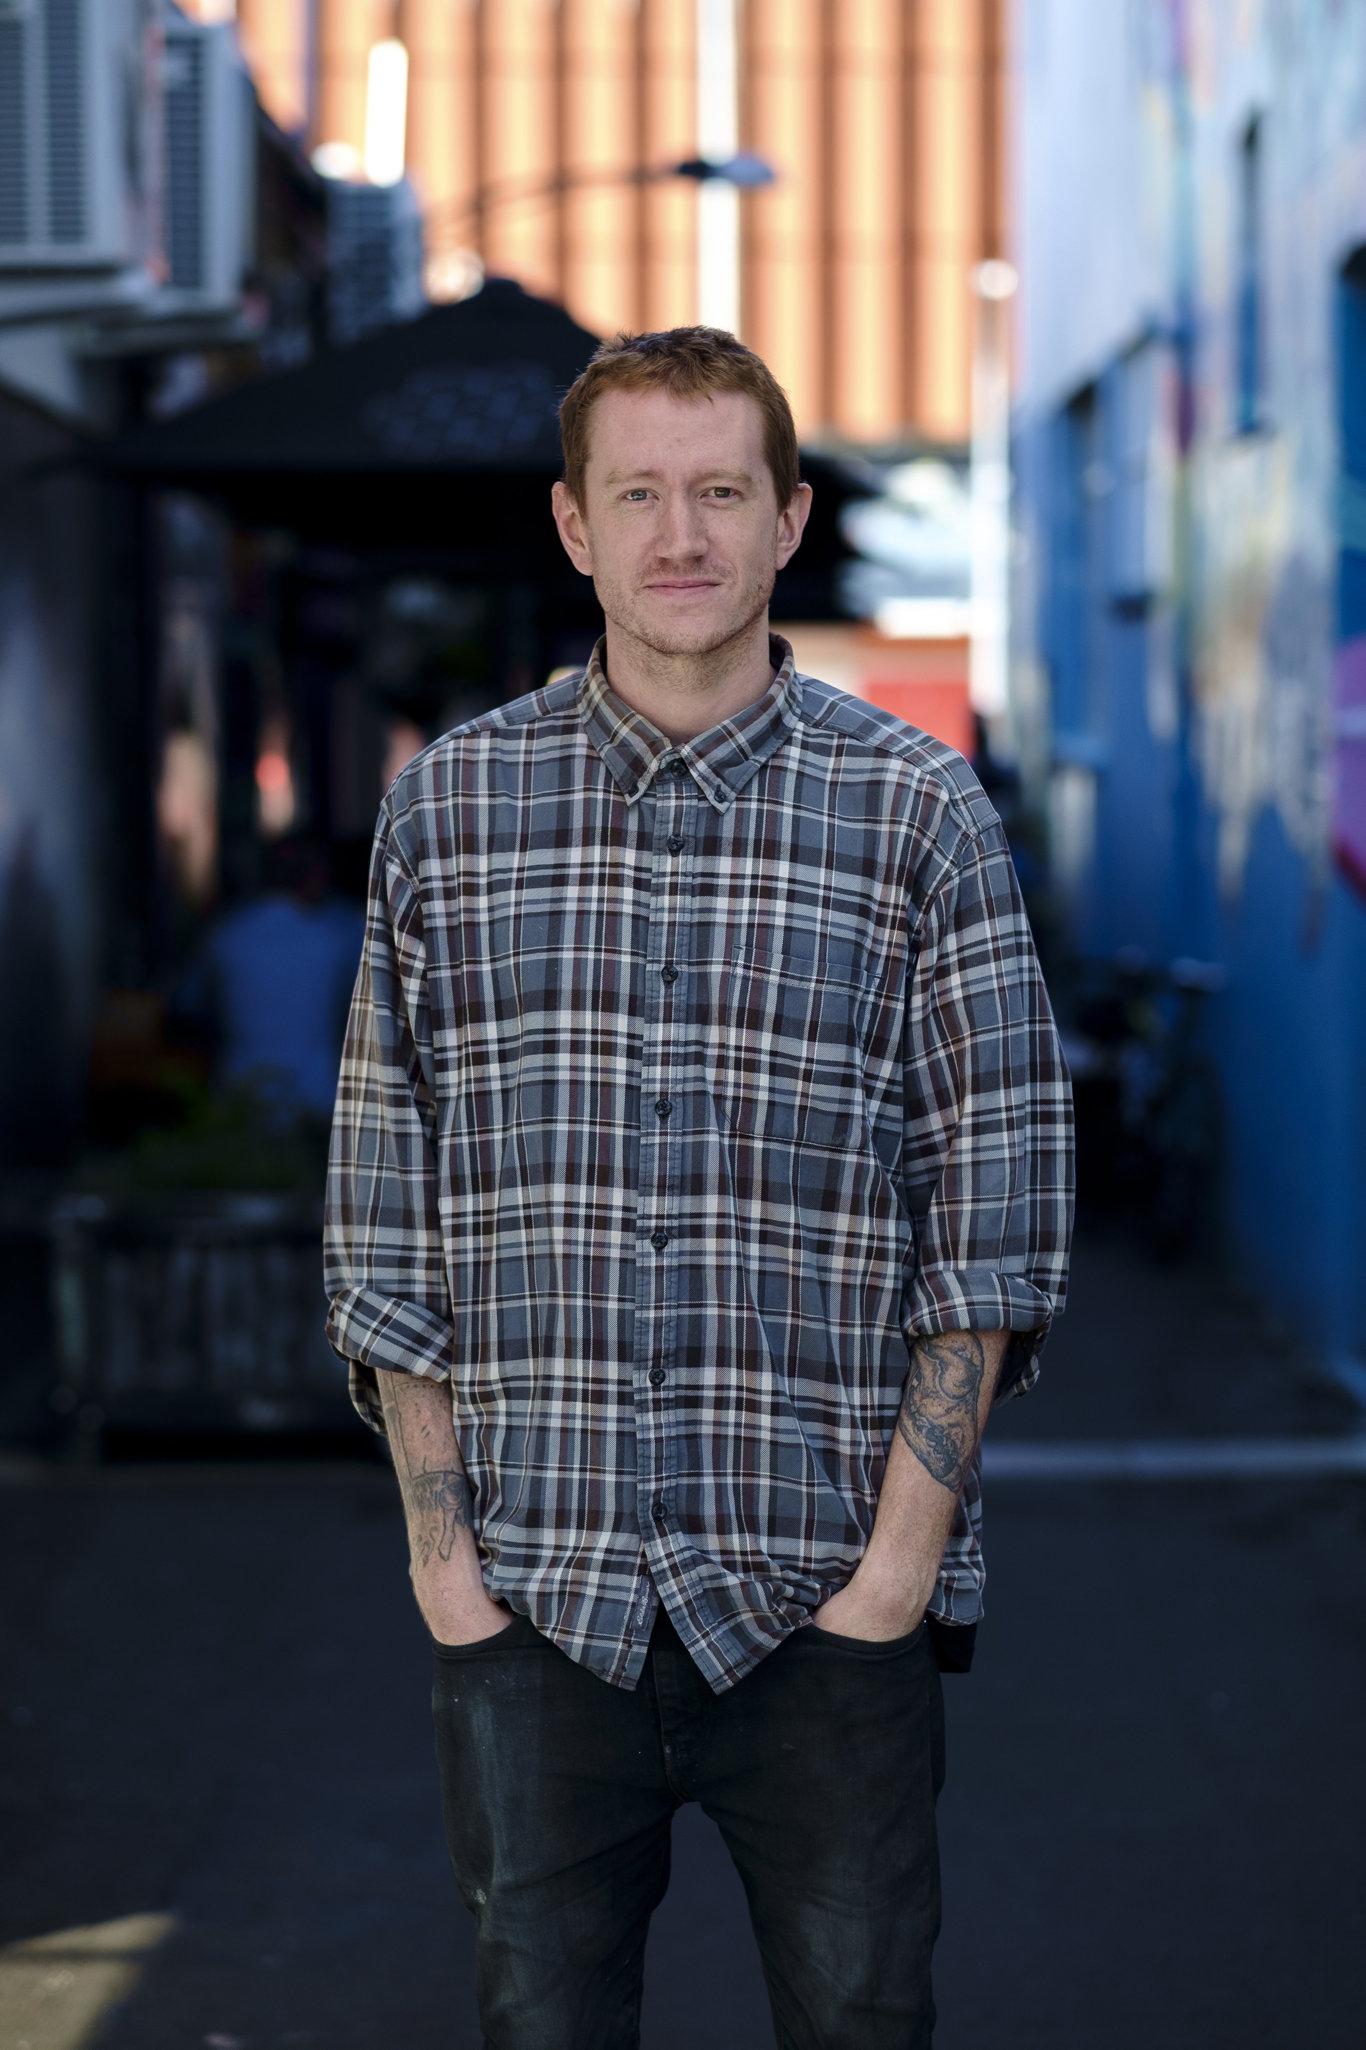 Toowoomba artist Dan Elborne.